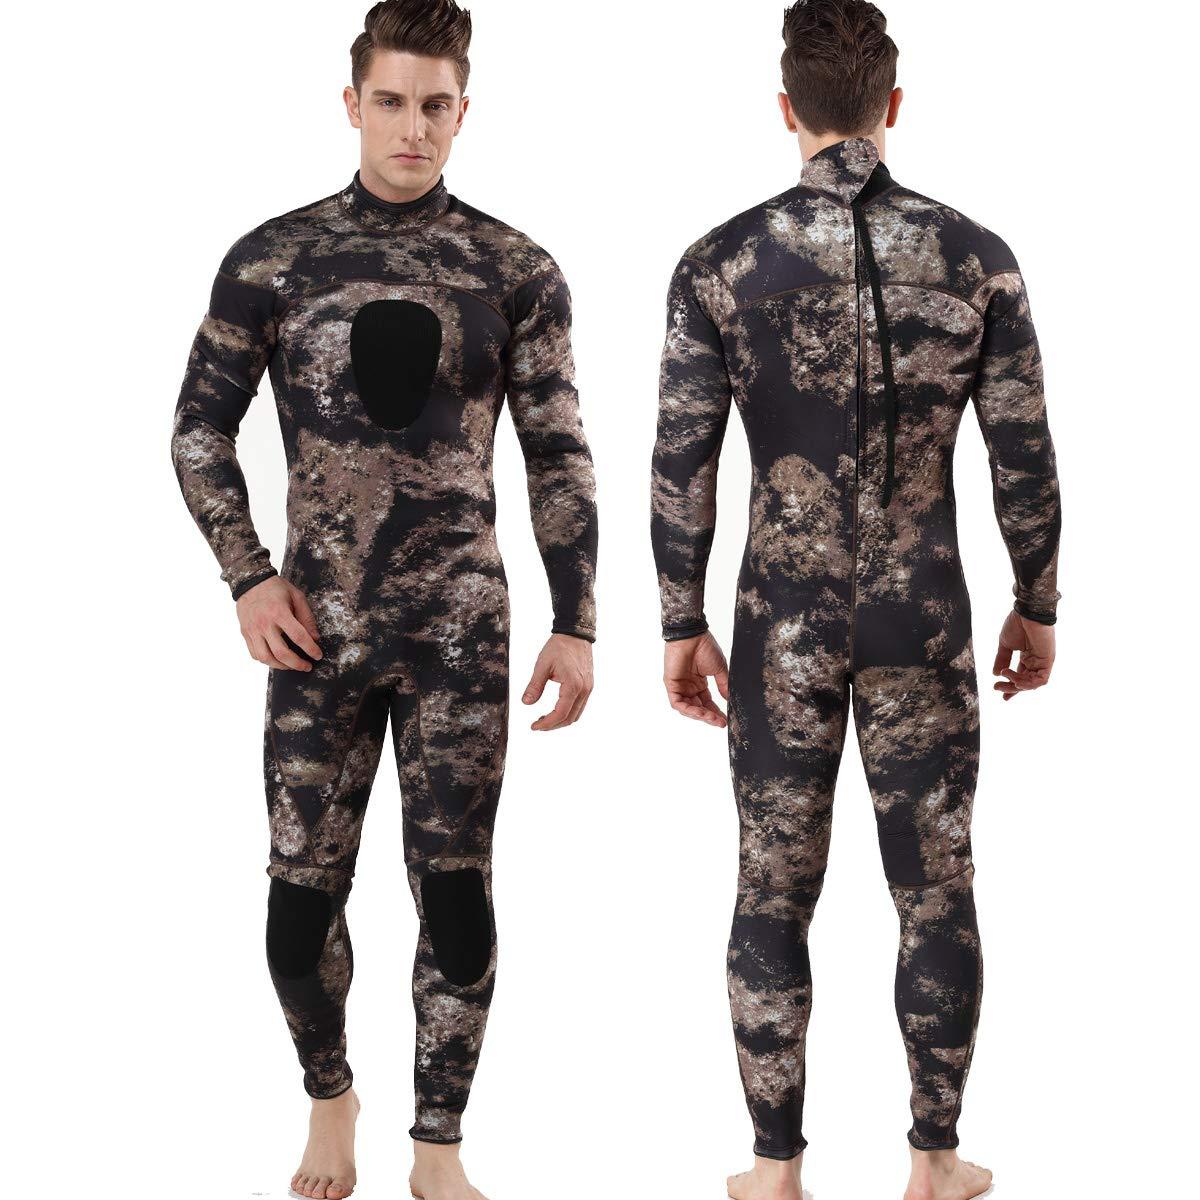 MYLEDI Neoprene 3mm Scuba Diving Suit One Piece Mens Spearfishing Full Body Spearfishing Wetsuit (MY045, L) by MYLEDI